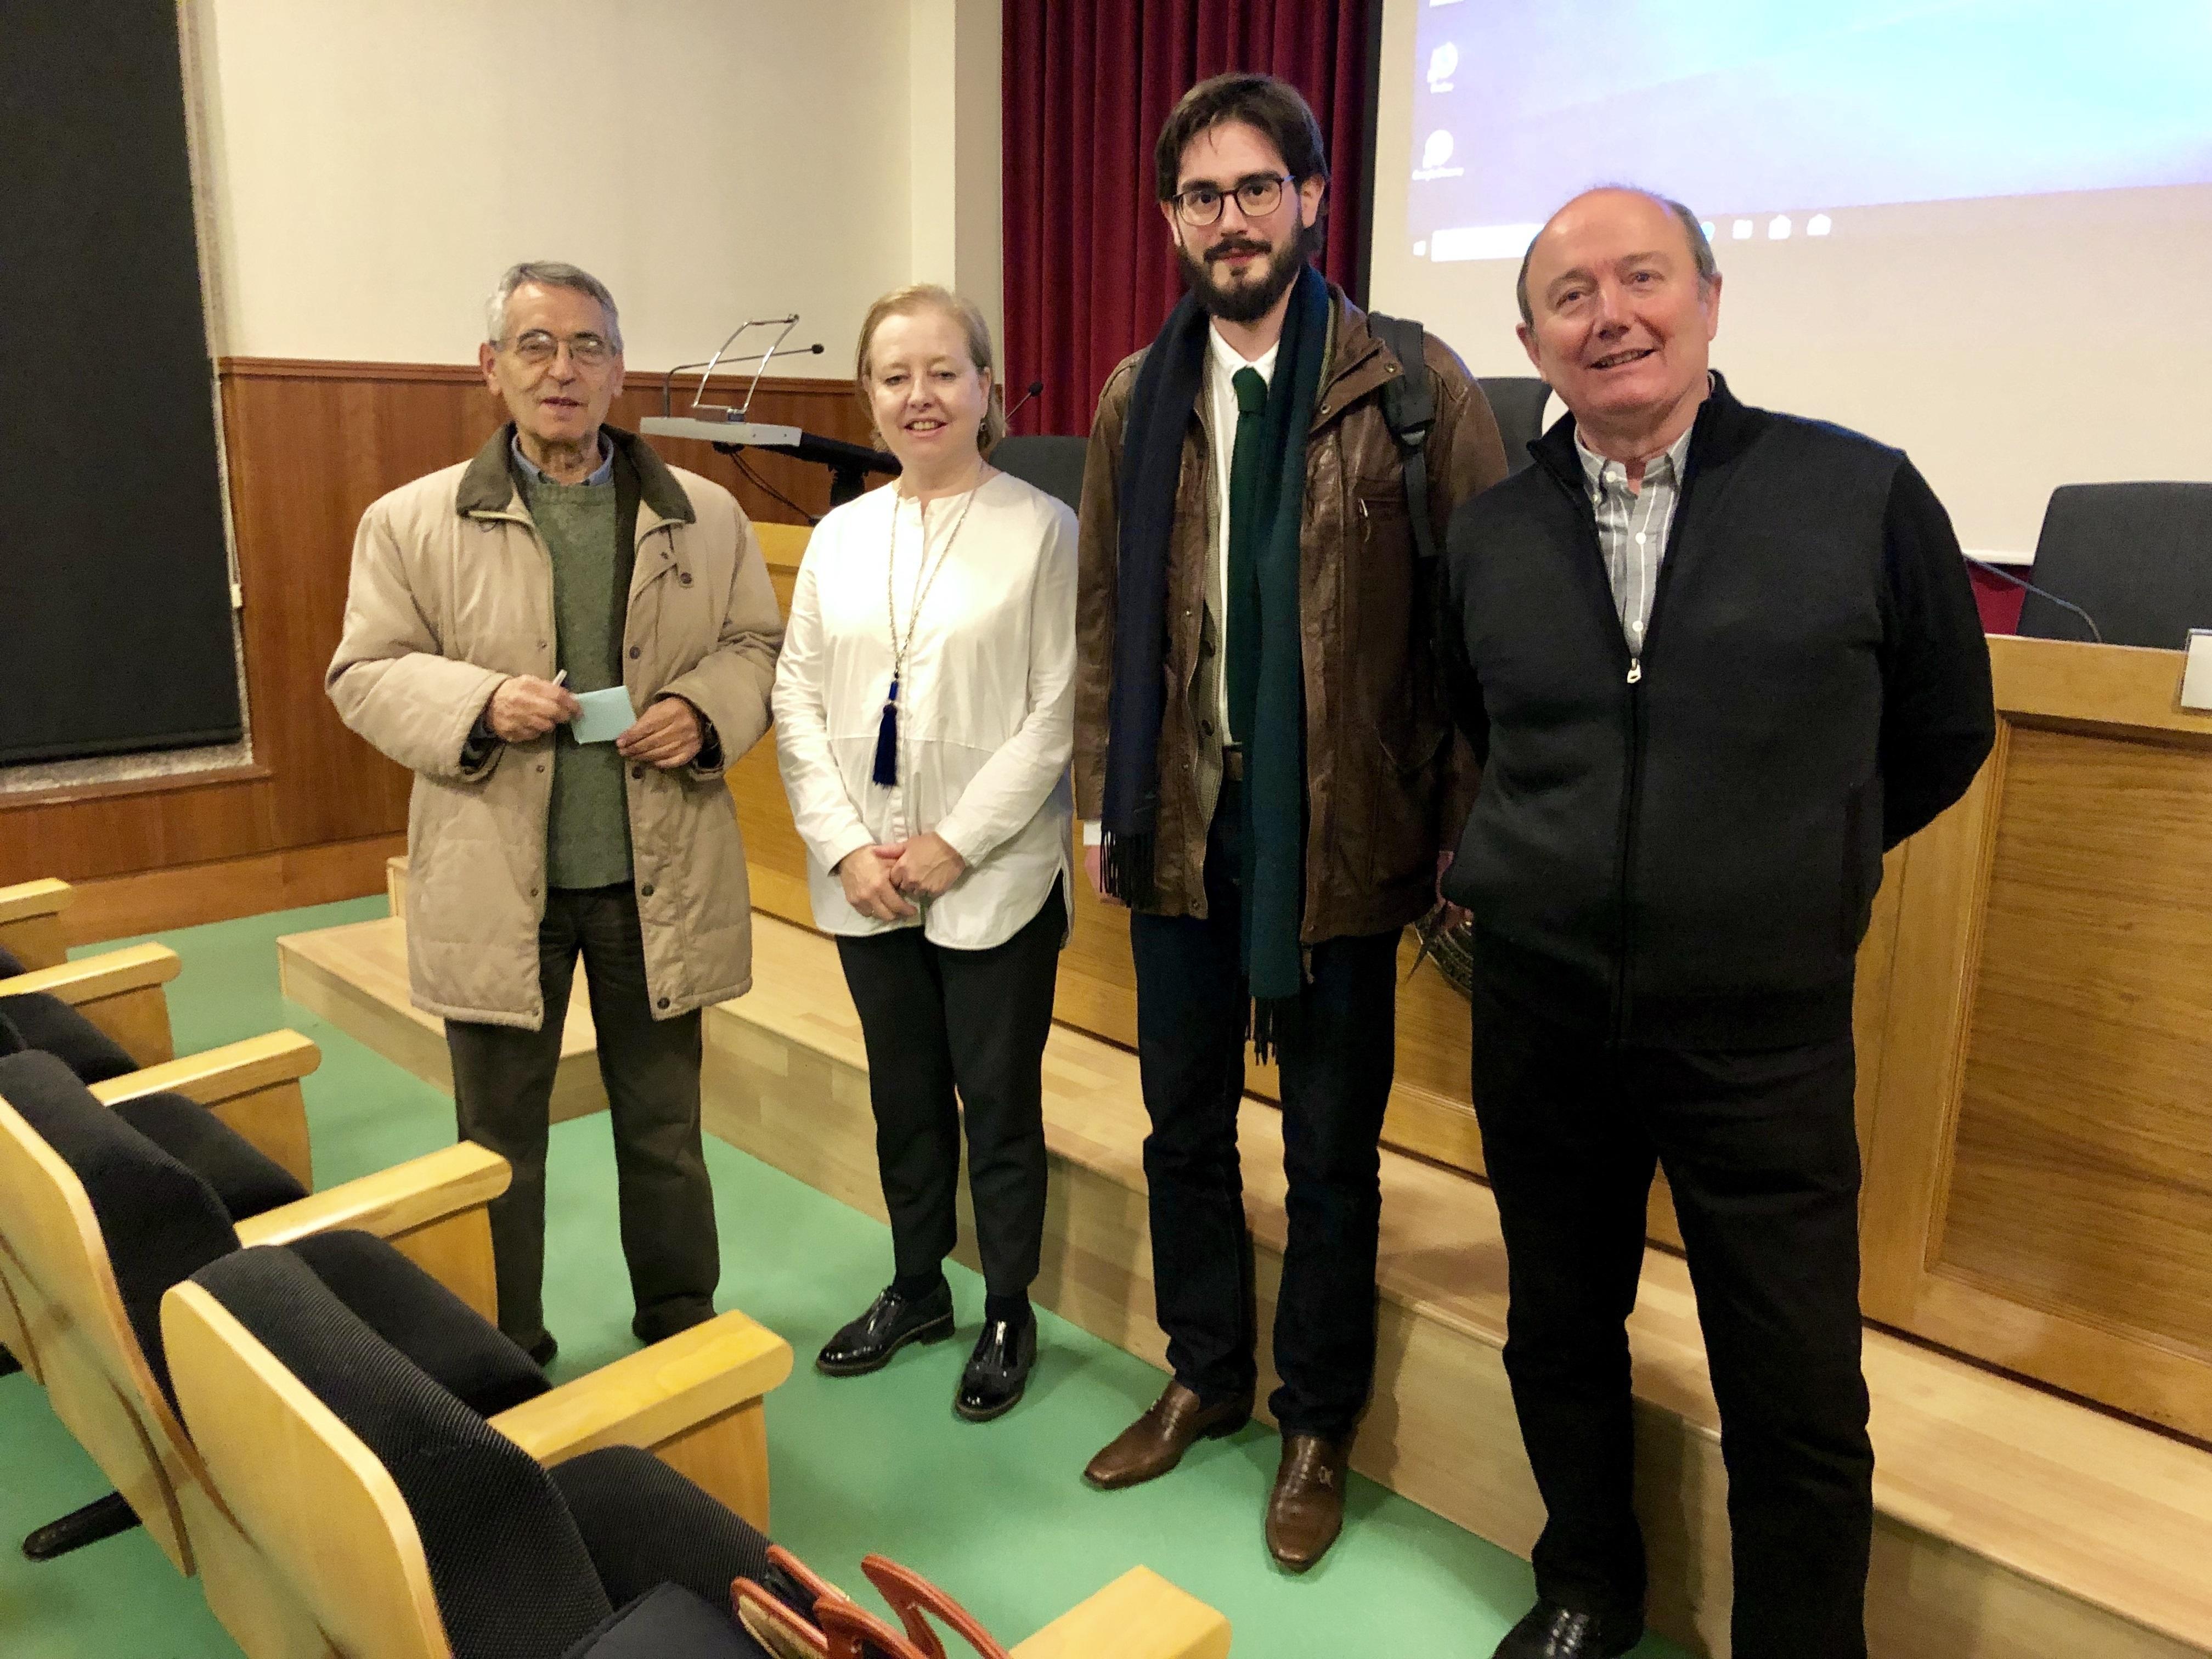 CDonferencia Francisco Cebreiros